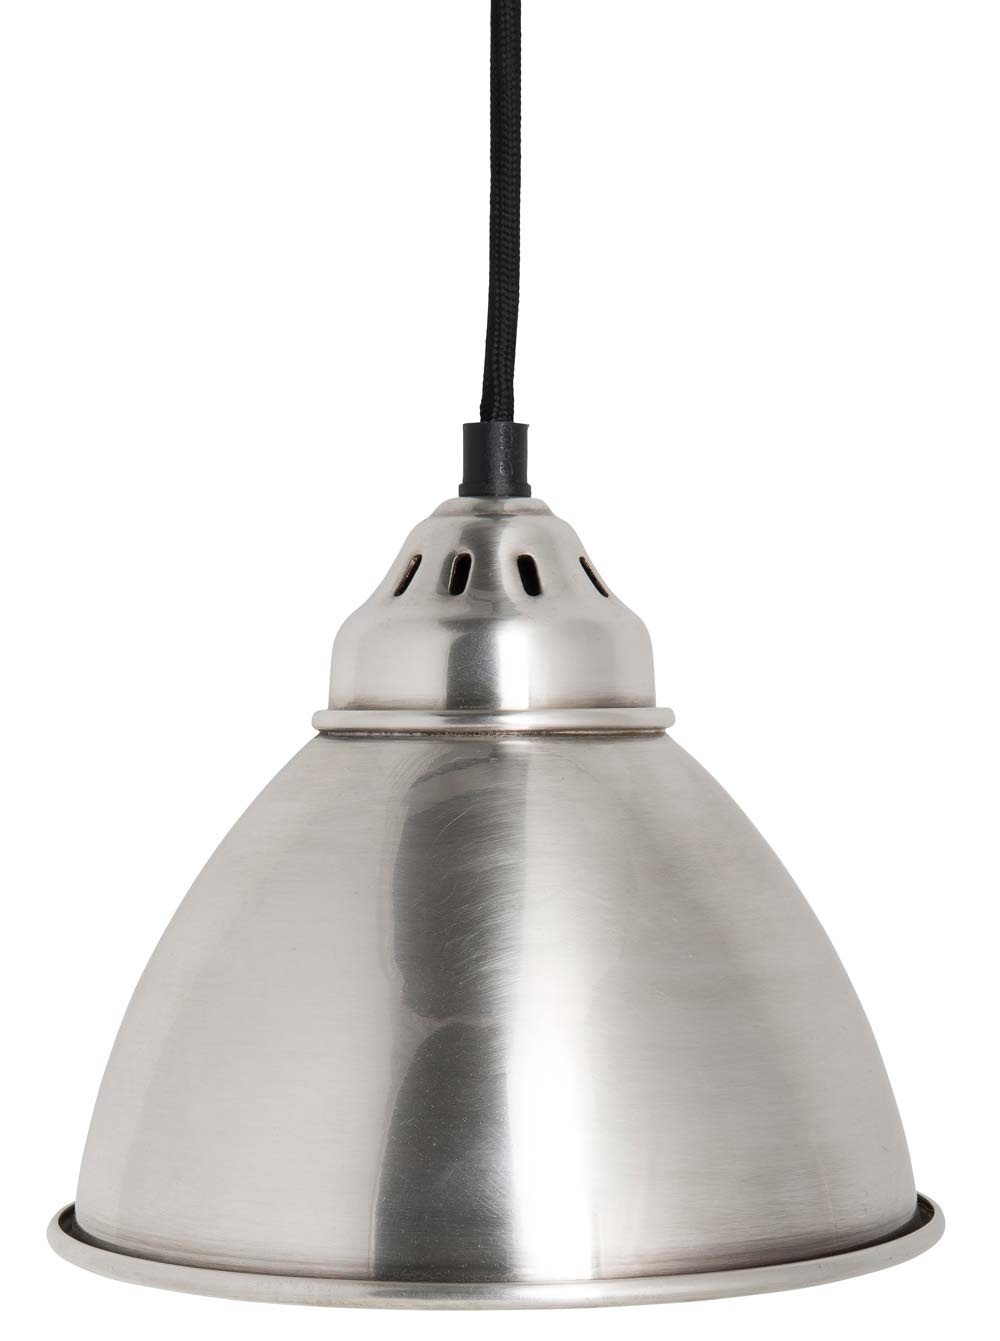 ib laursen Ib laursen hængelampe - sølv metal, ant.sølv finish, sort tekstil ledning på boboonline.dk